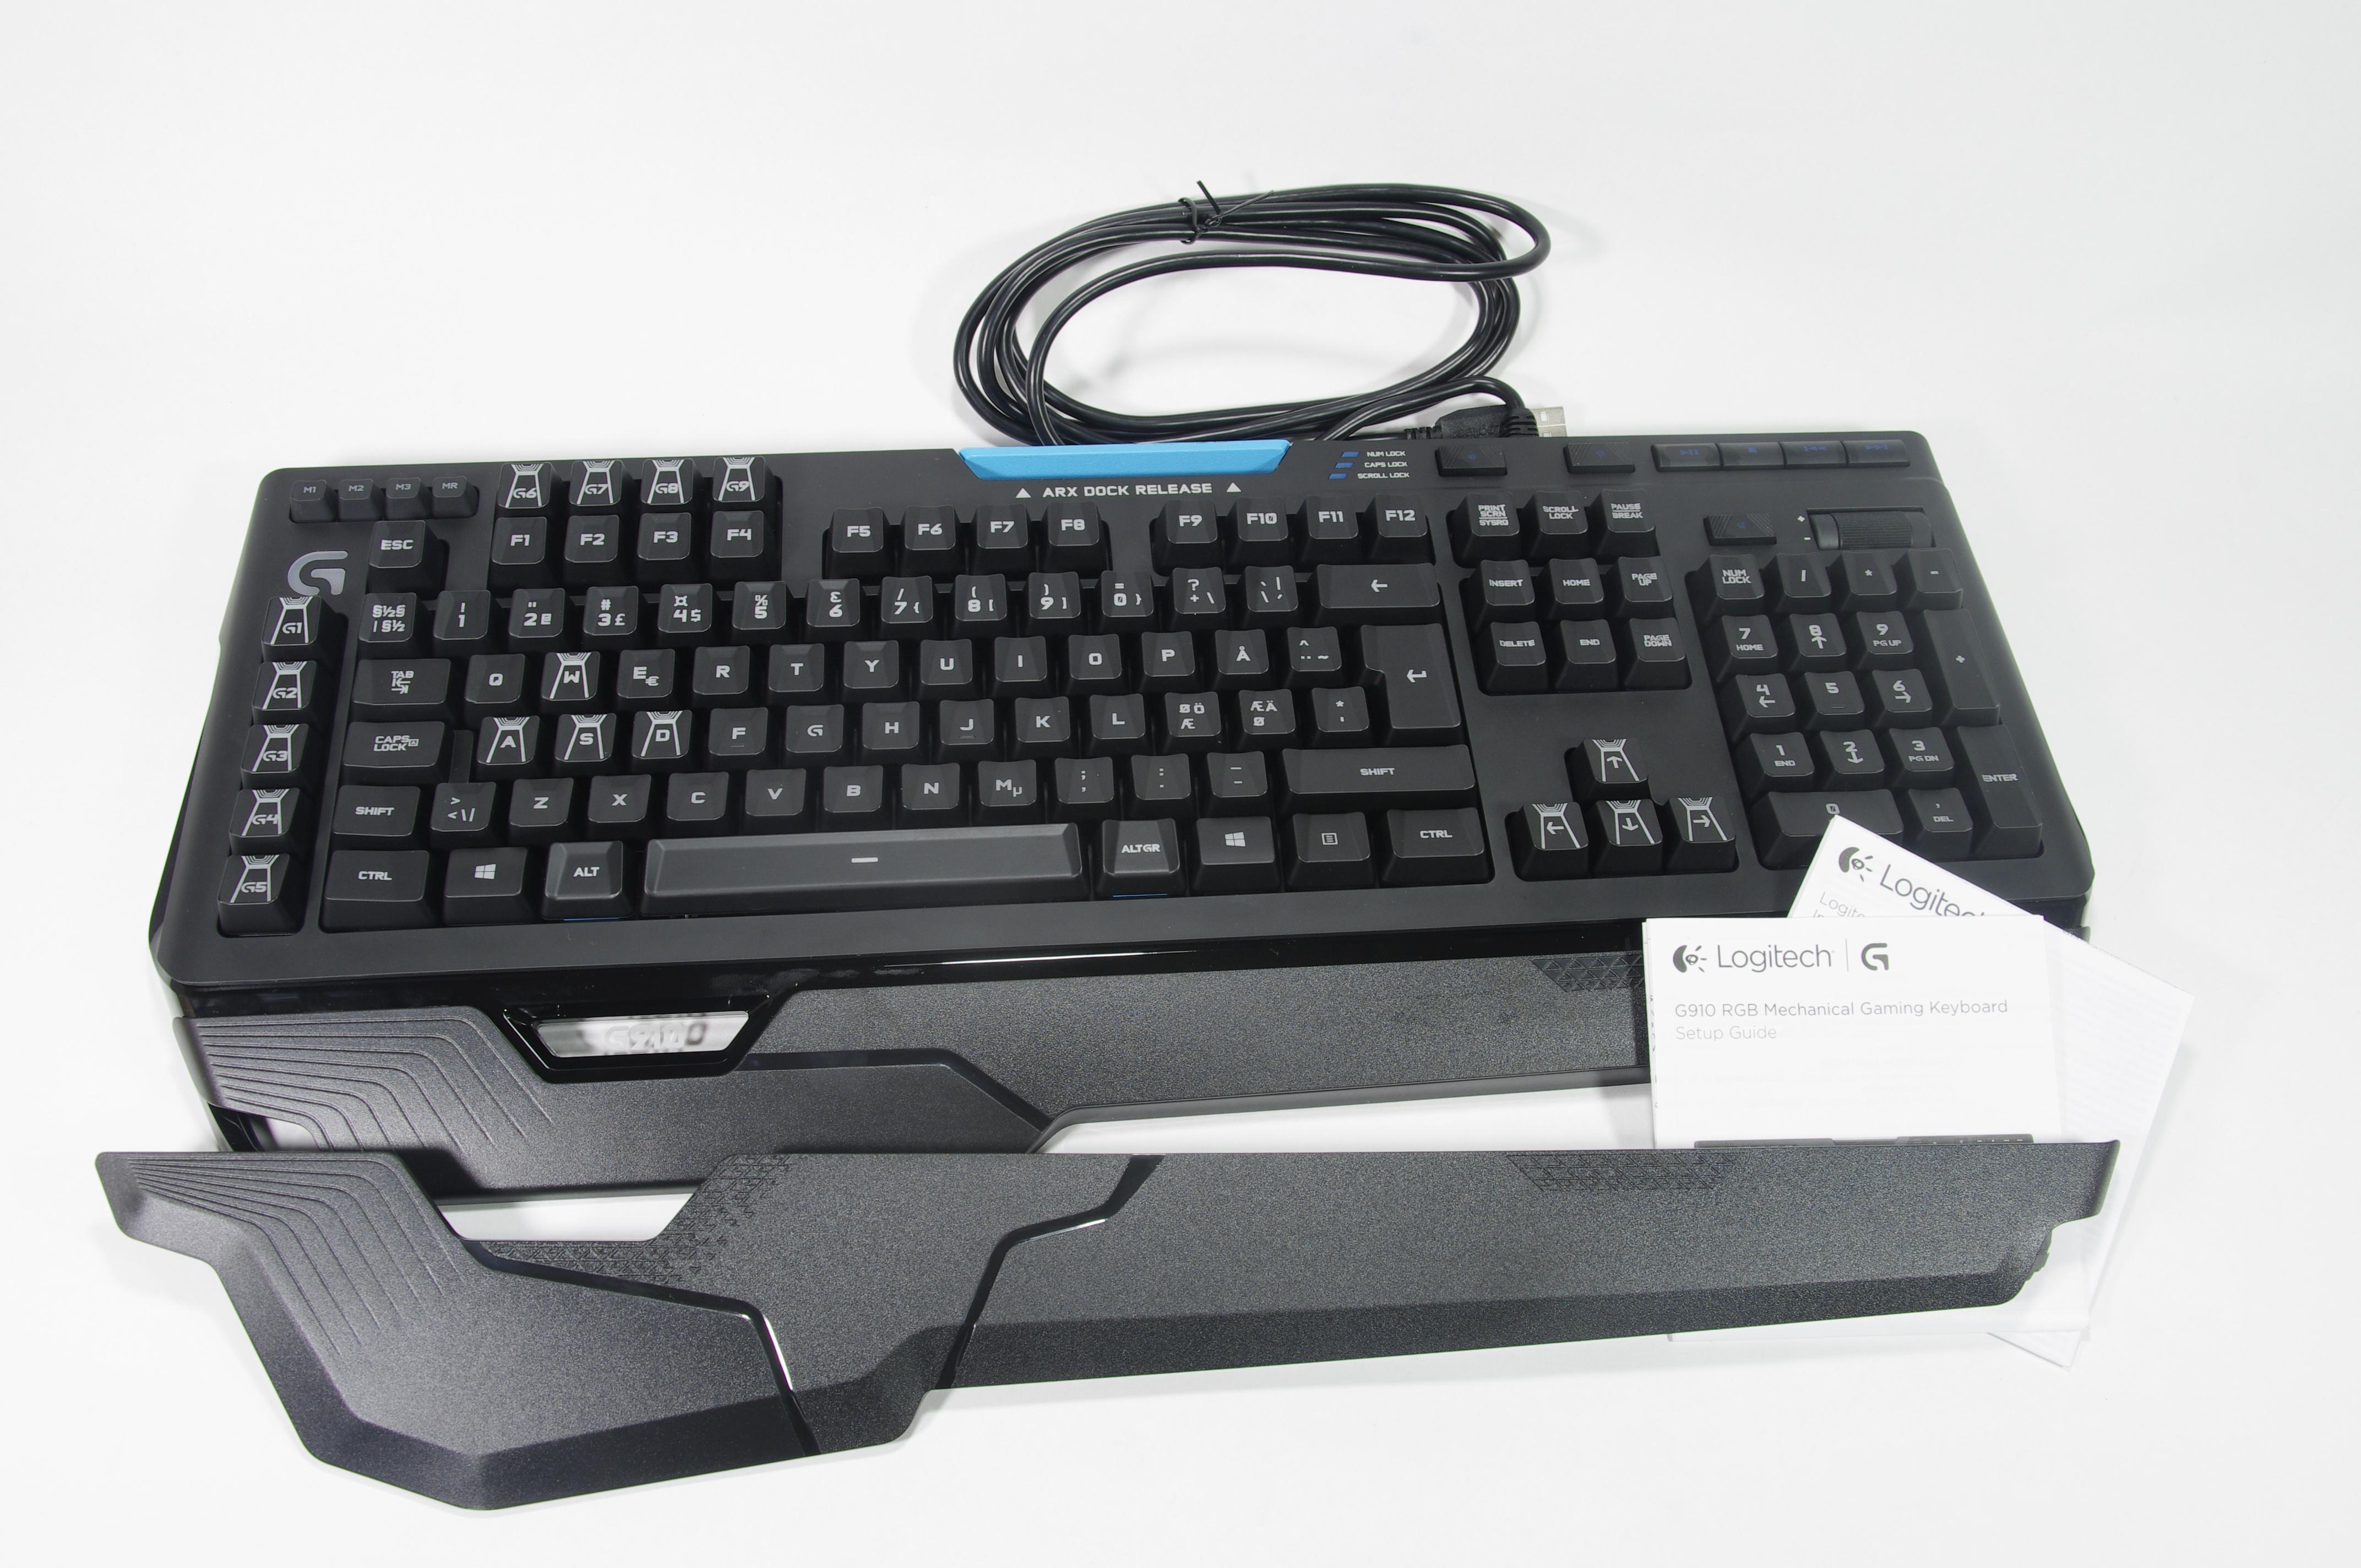 Logitech G910 - Представяне